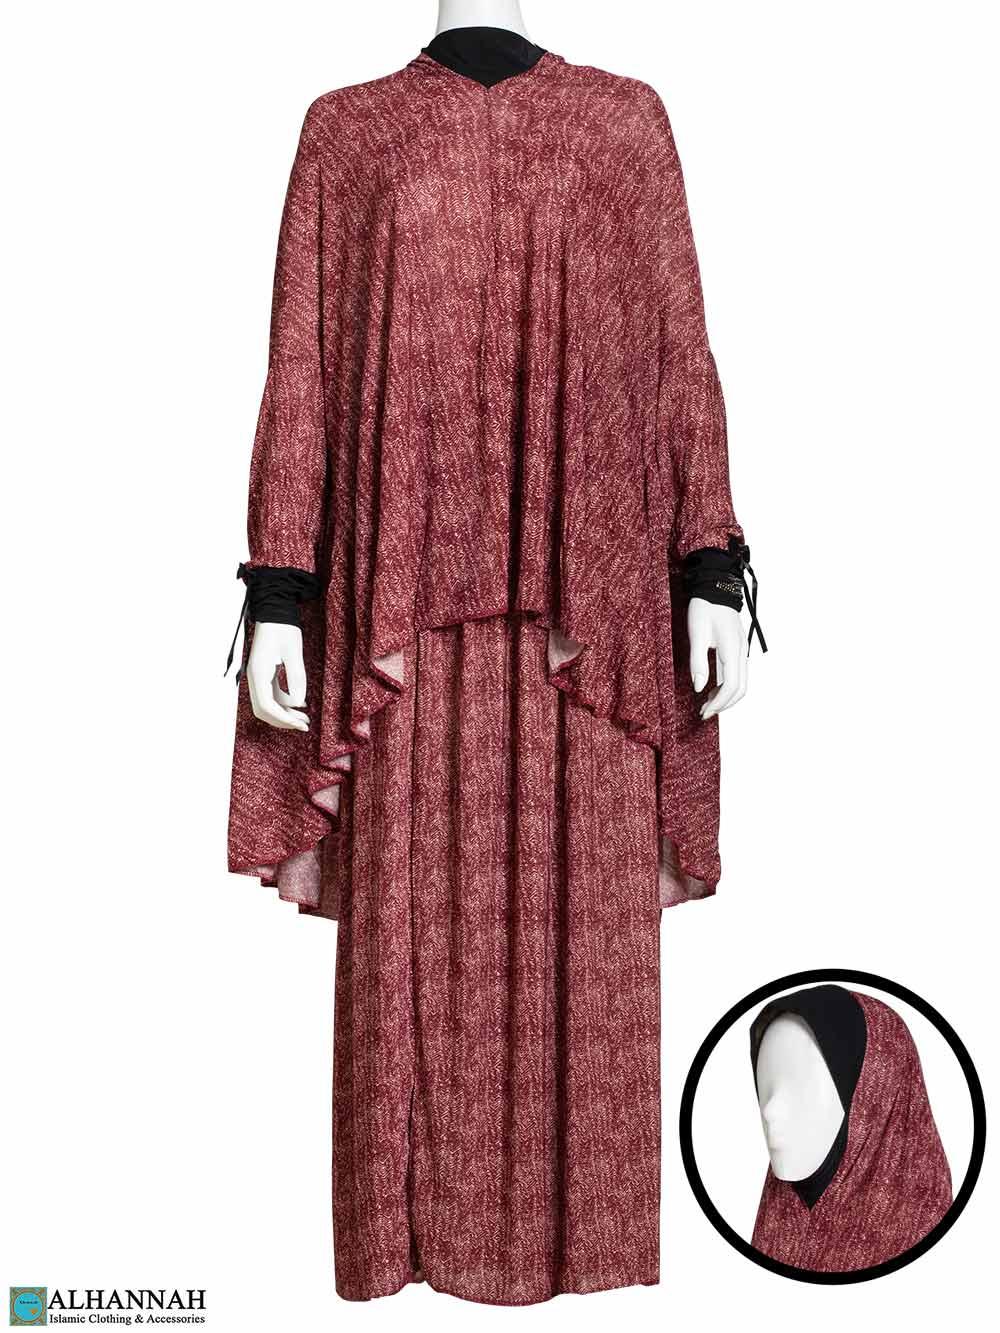 2 Piece Prayer Outfit - Cranberry